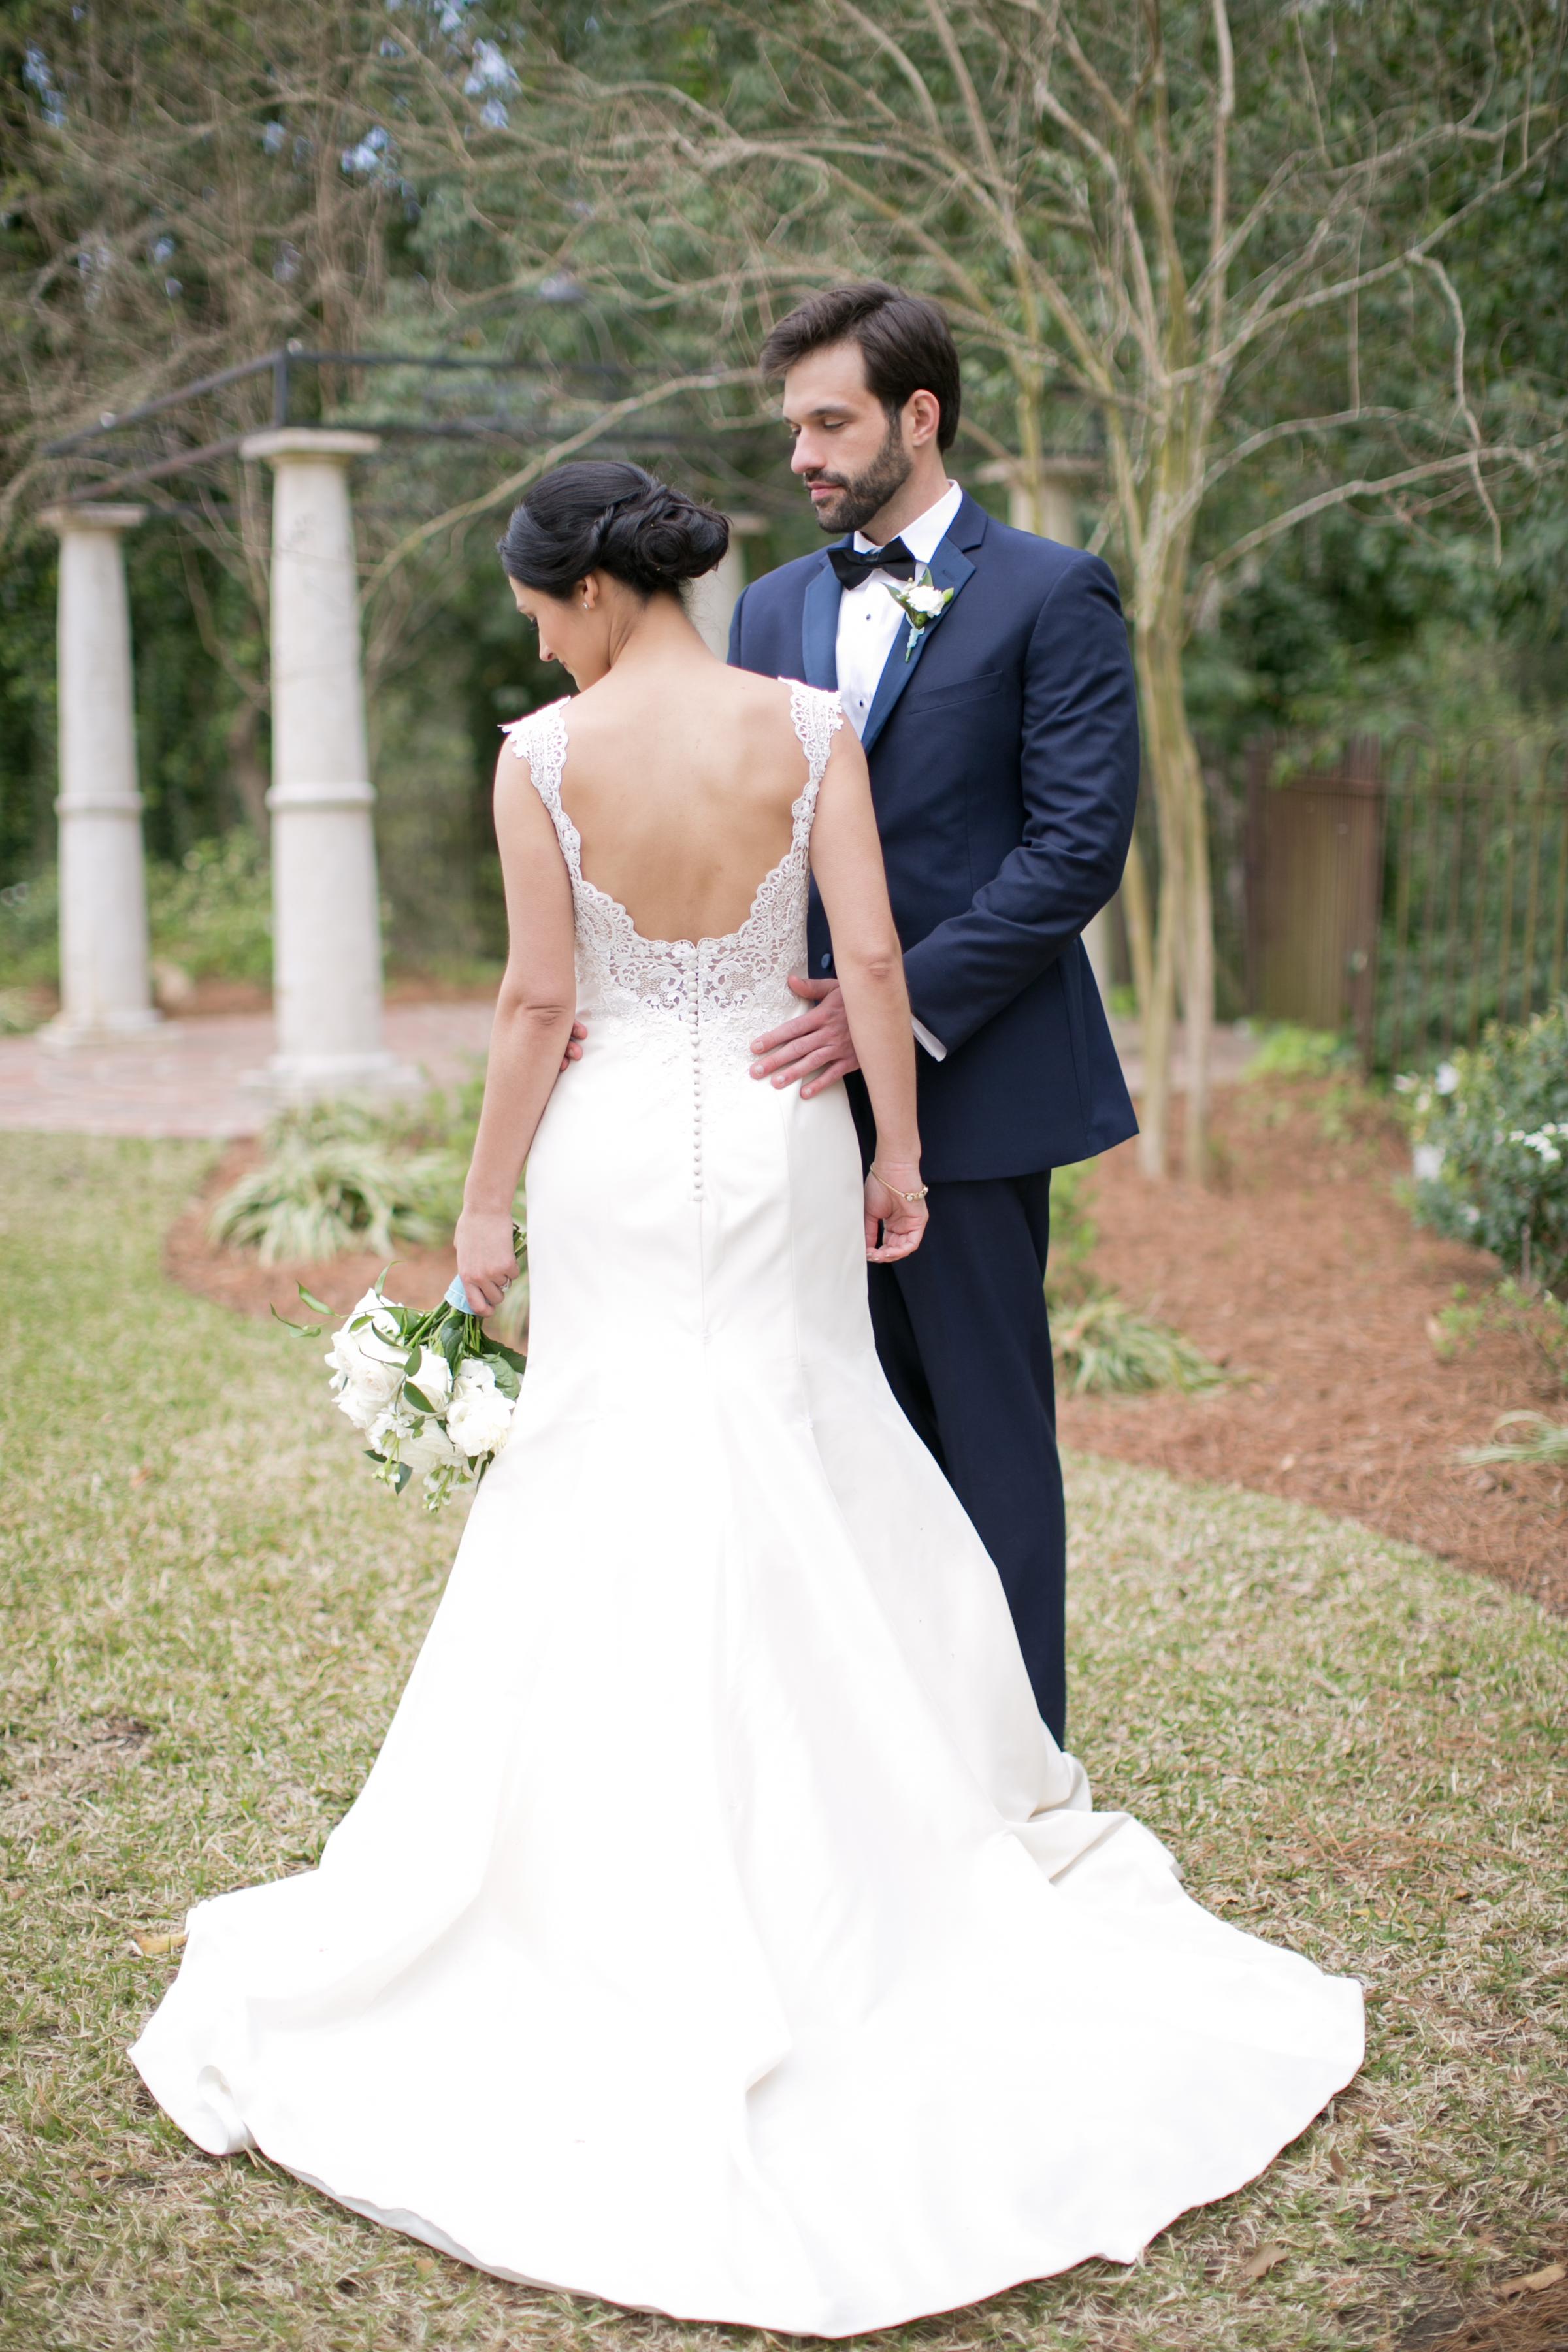 columbia_sc_wedding136.jpg